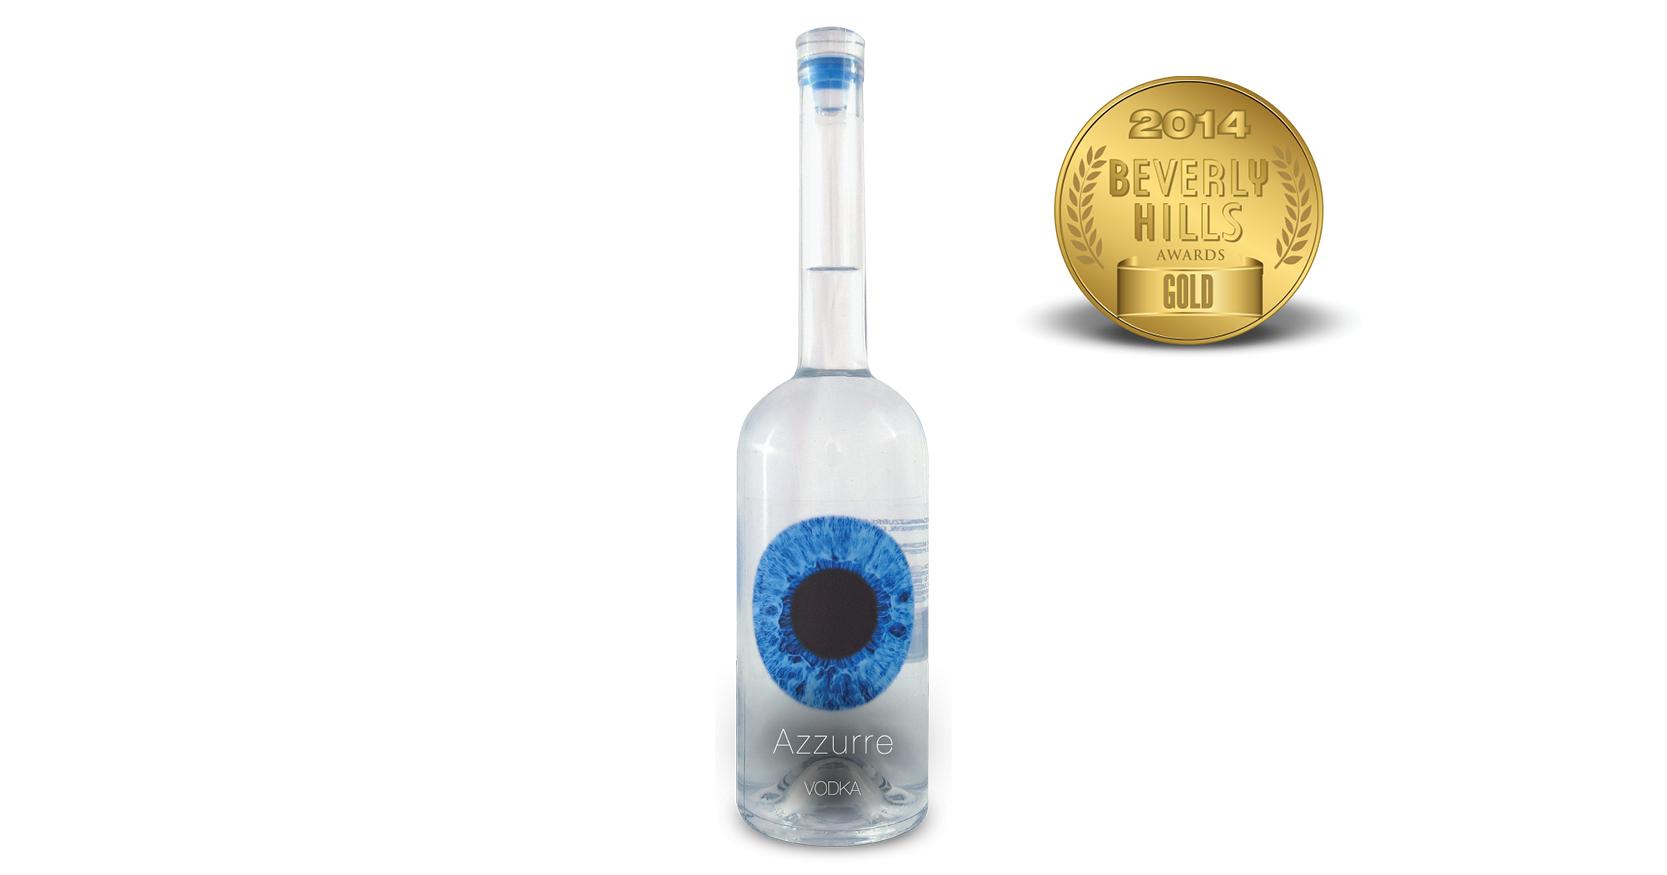 Azzurre Vodka